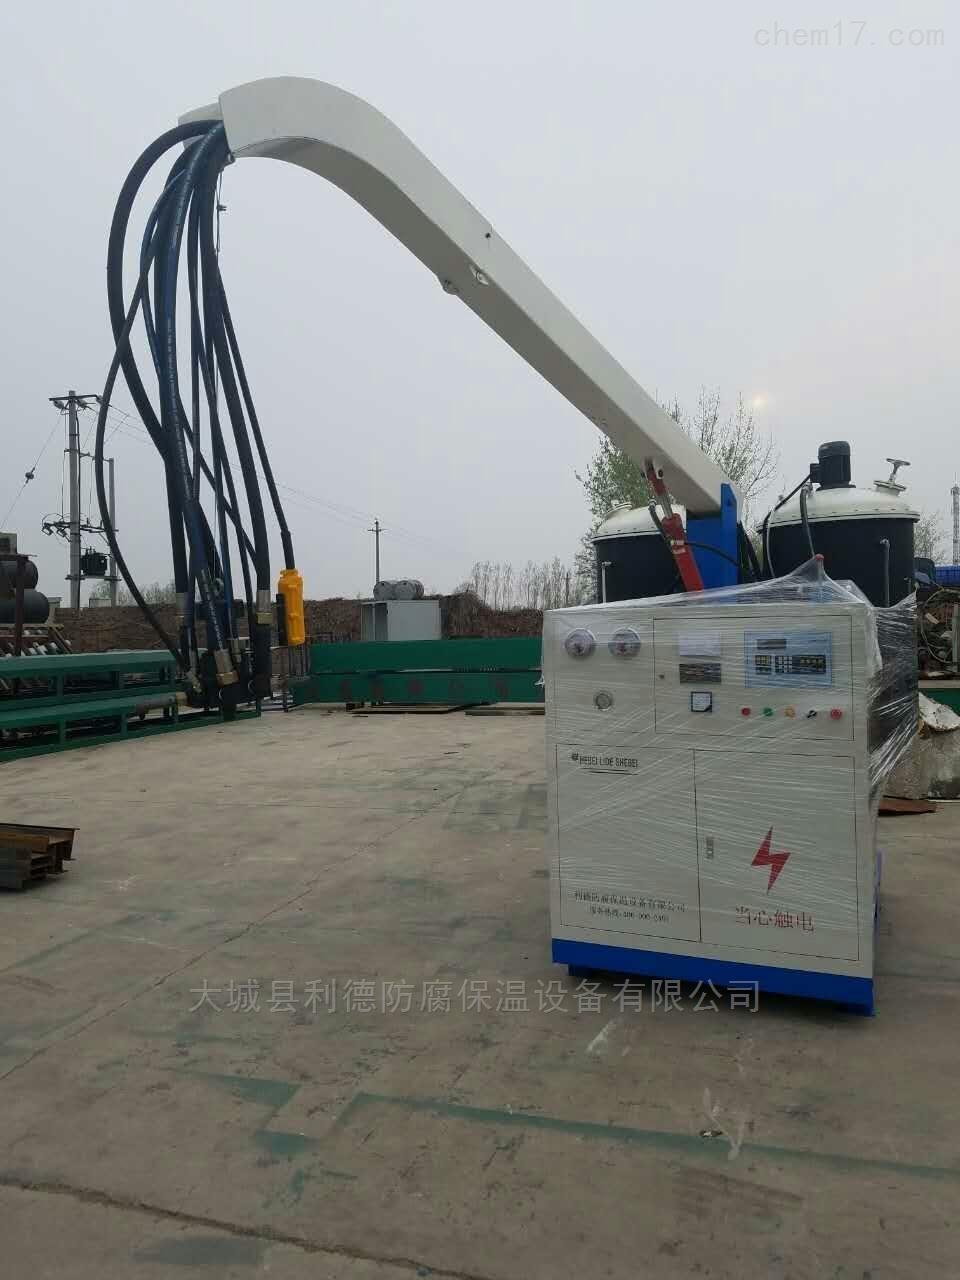 JNJX-Q1600高压聚氨酯发泡机厂家